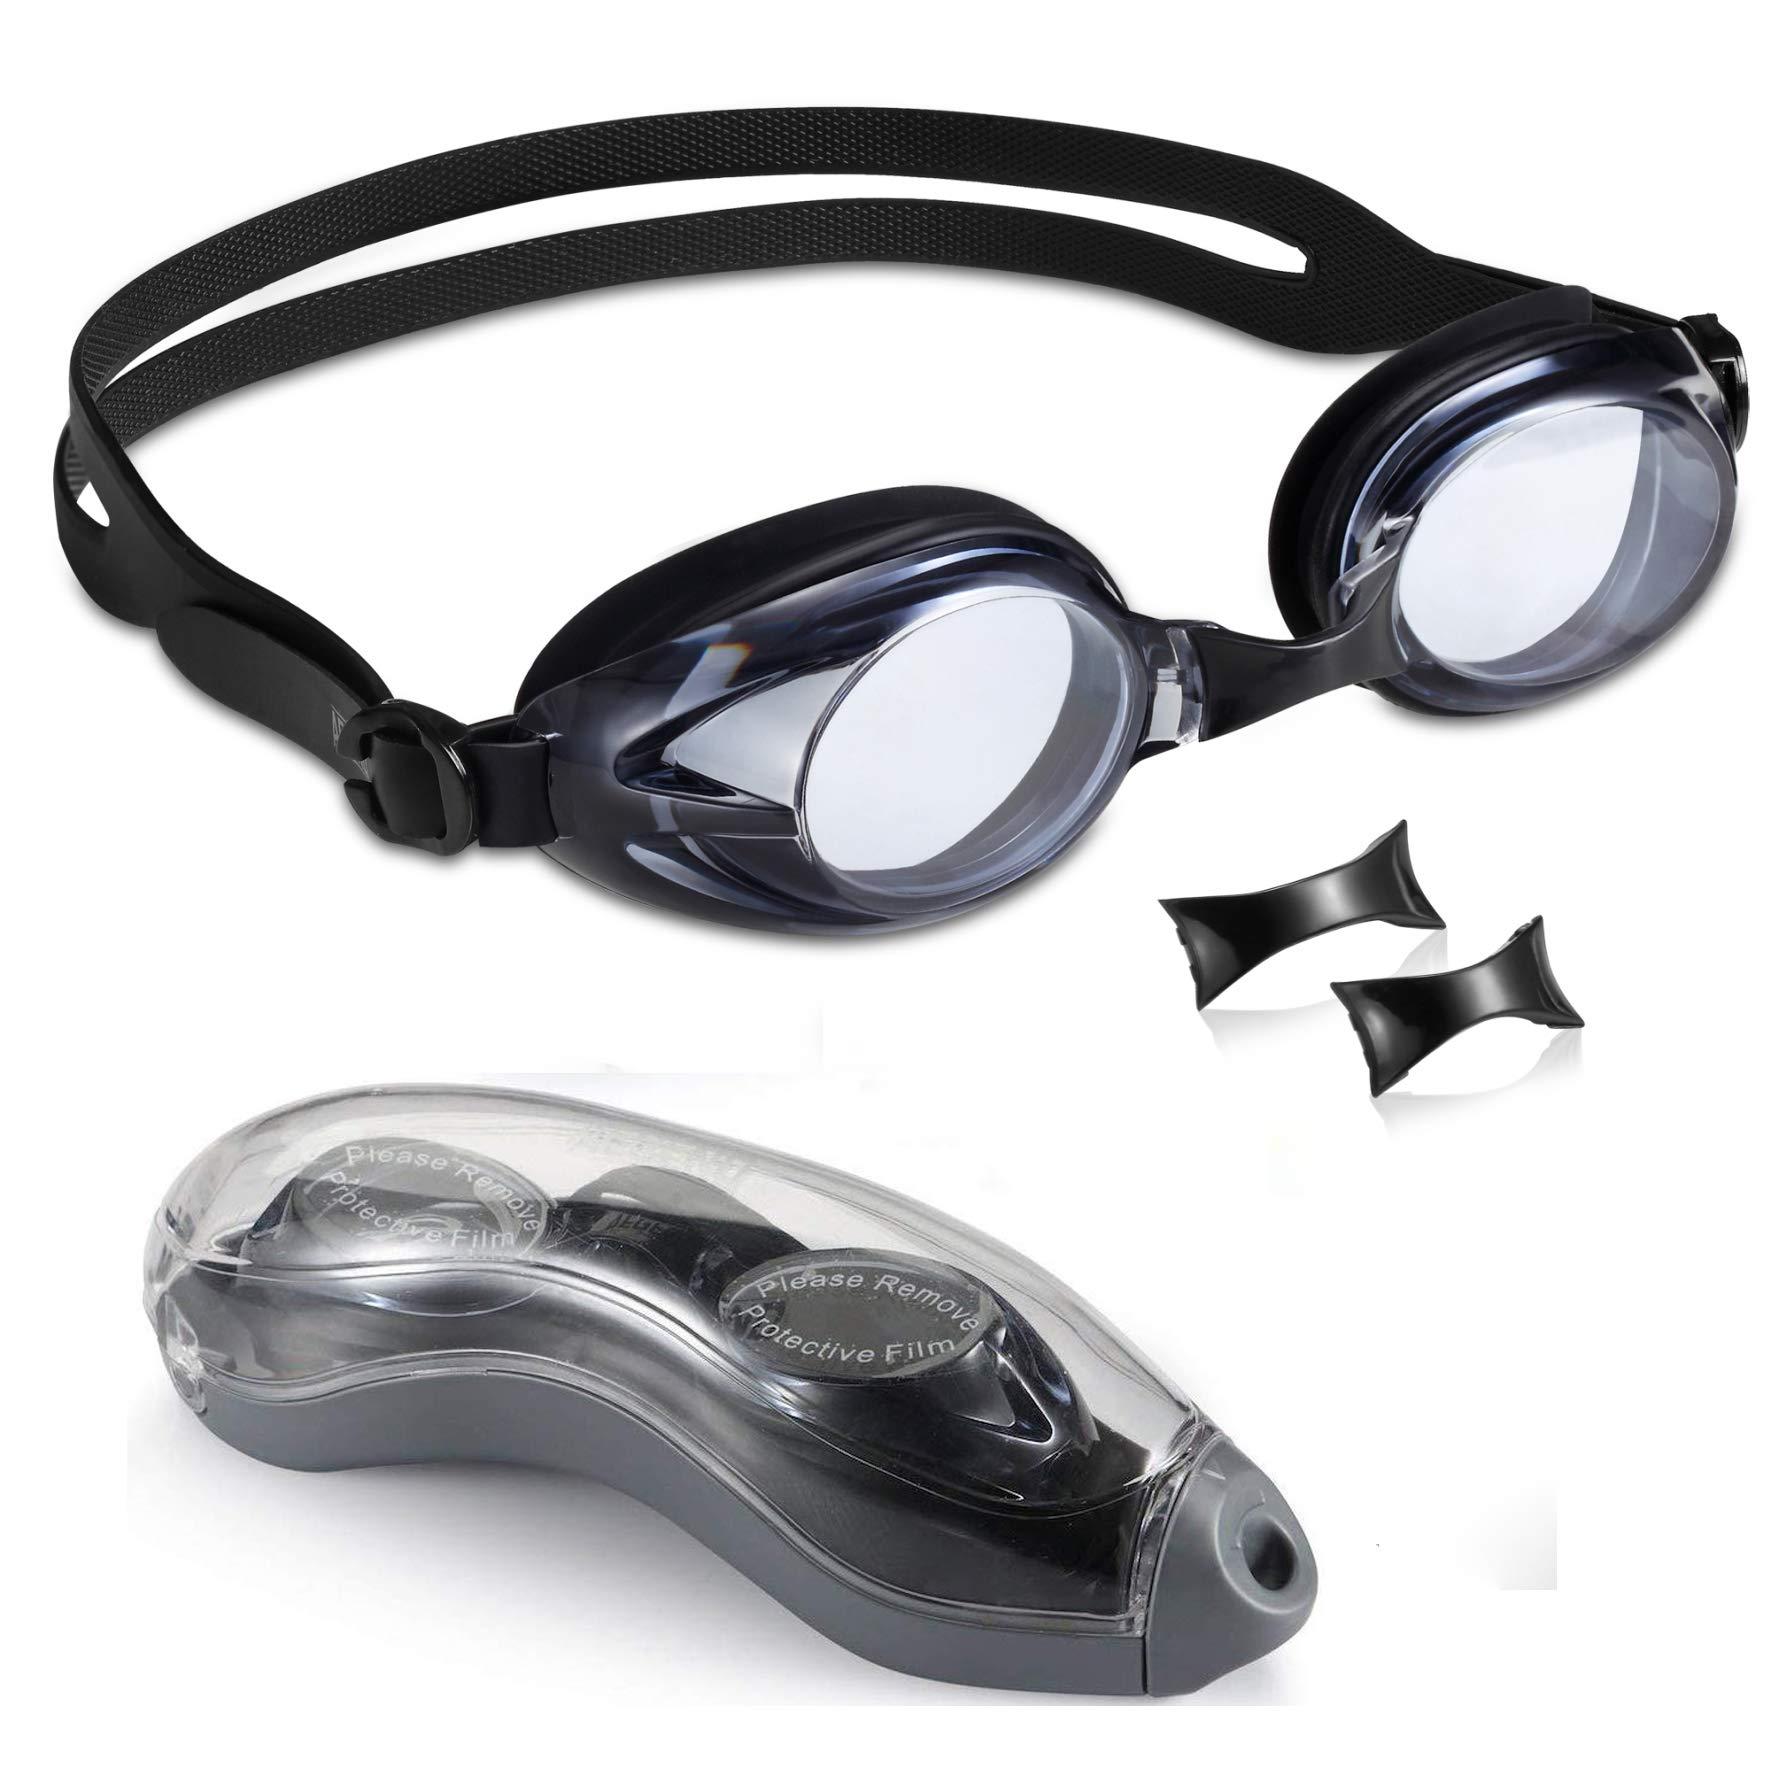 Aegend Swim Goggles 3 Sizes Nose Pieces Clear Vision Anti-Fog Men Women Adult